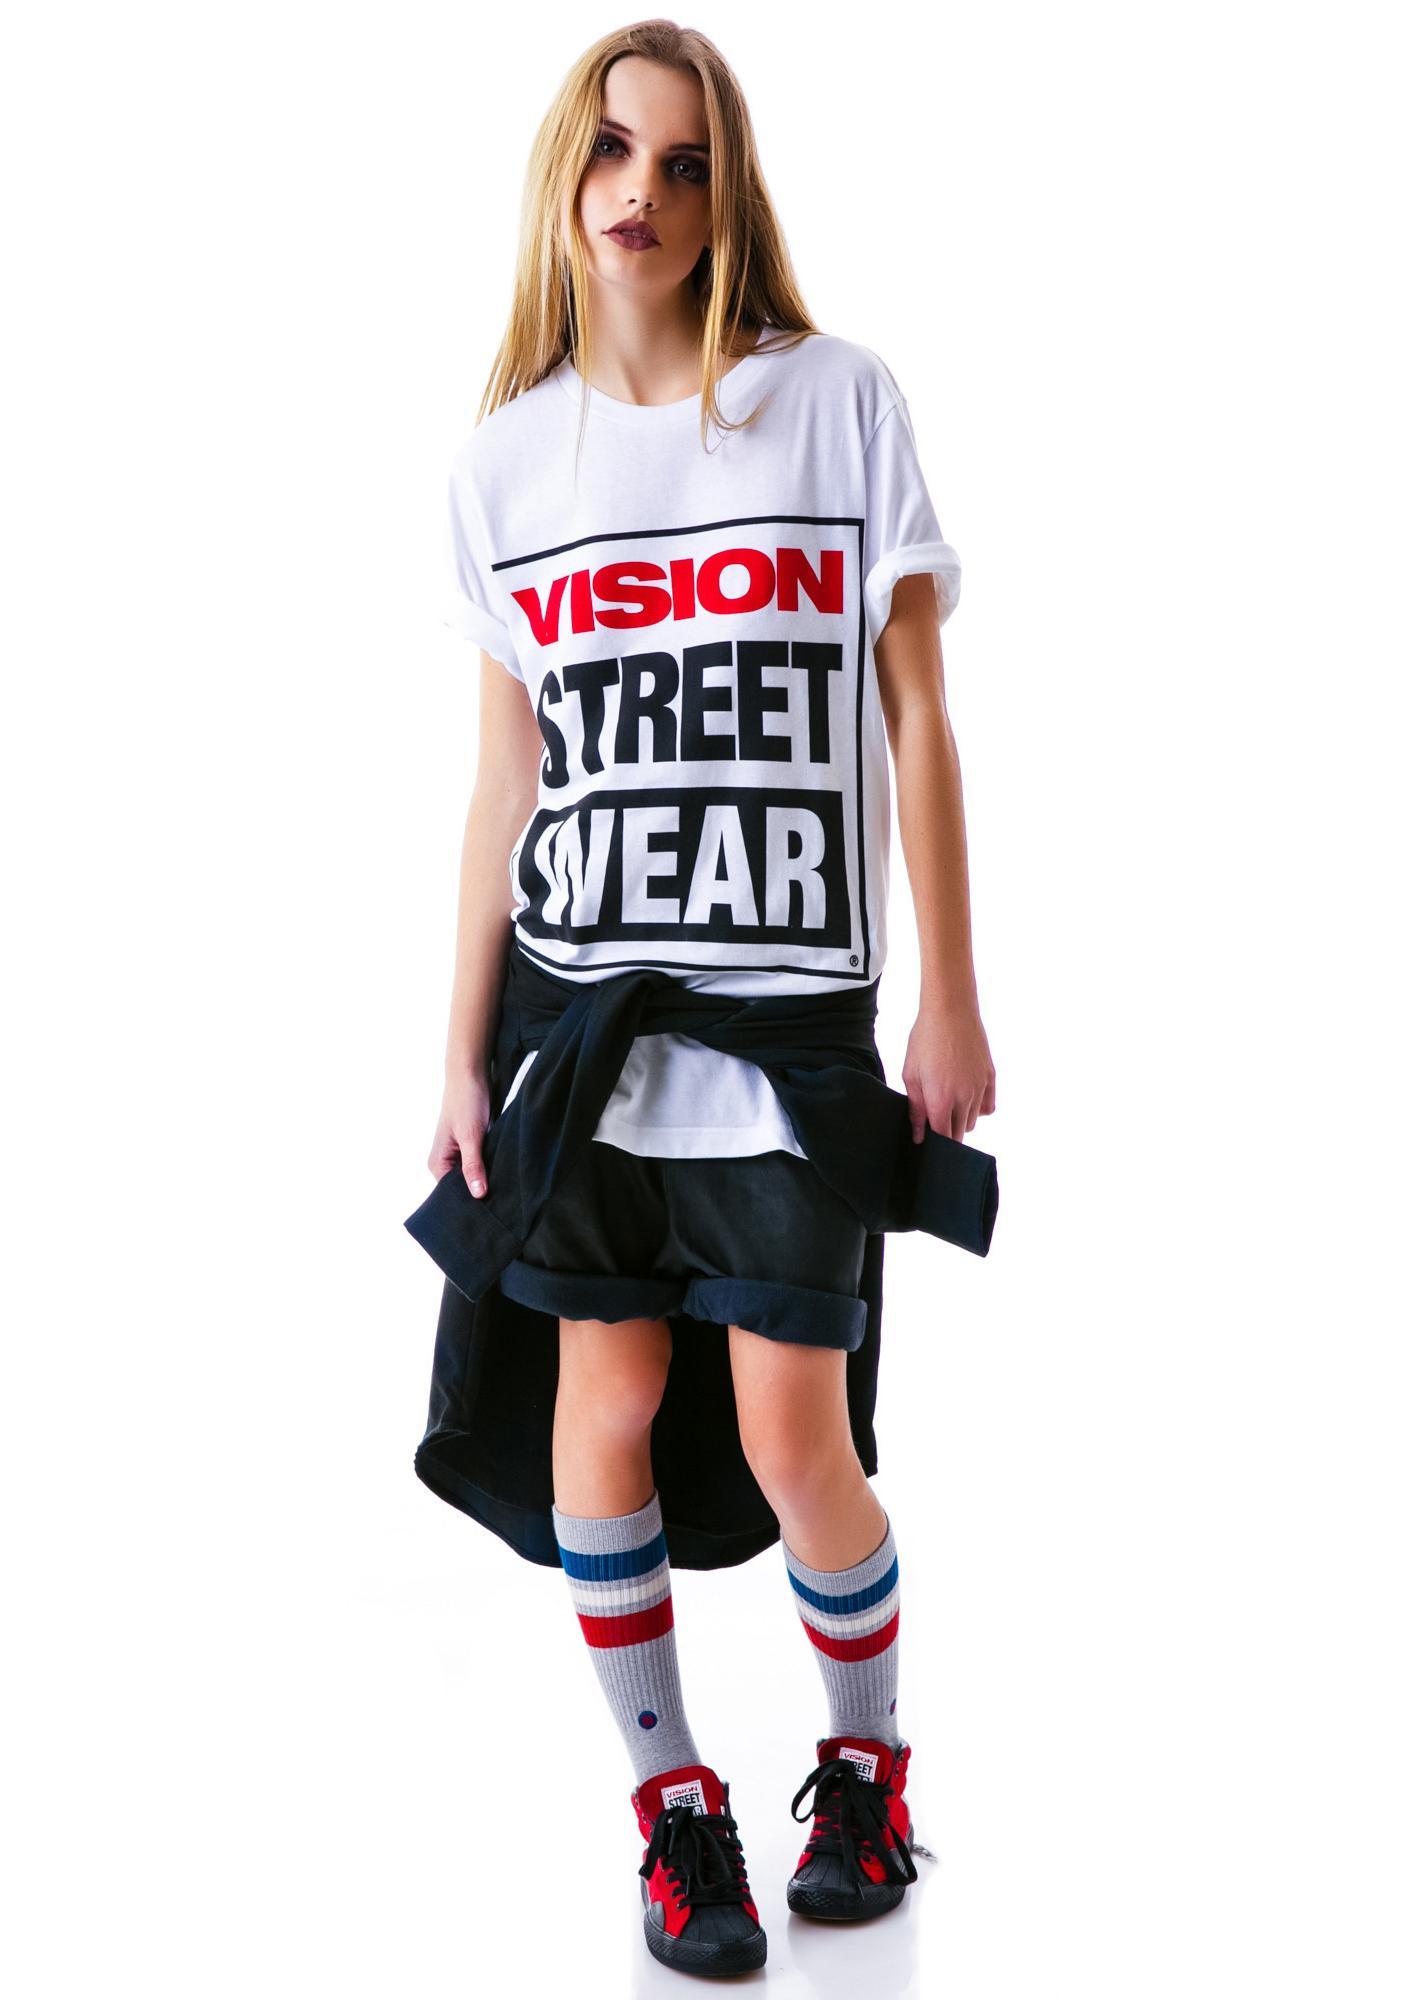 Vision Street Wear Vision Street Wear Logo Tee